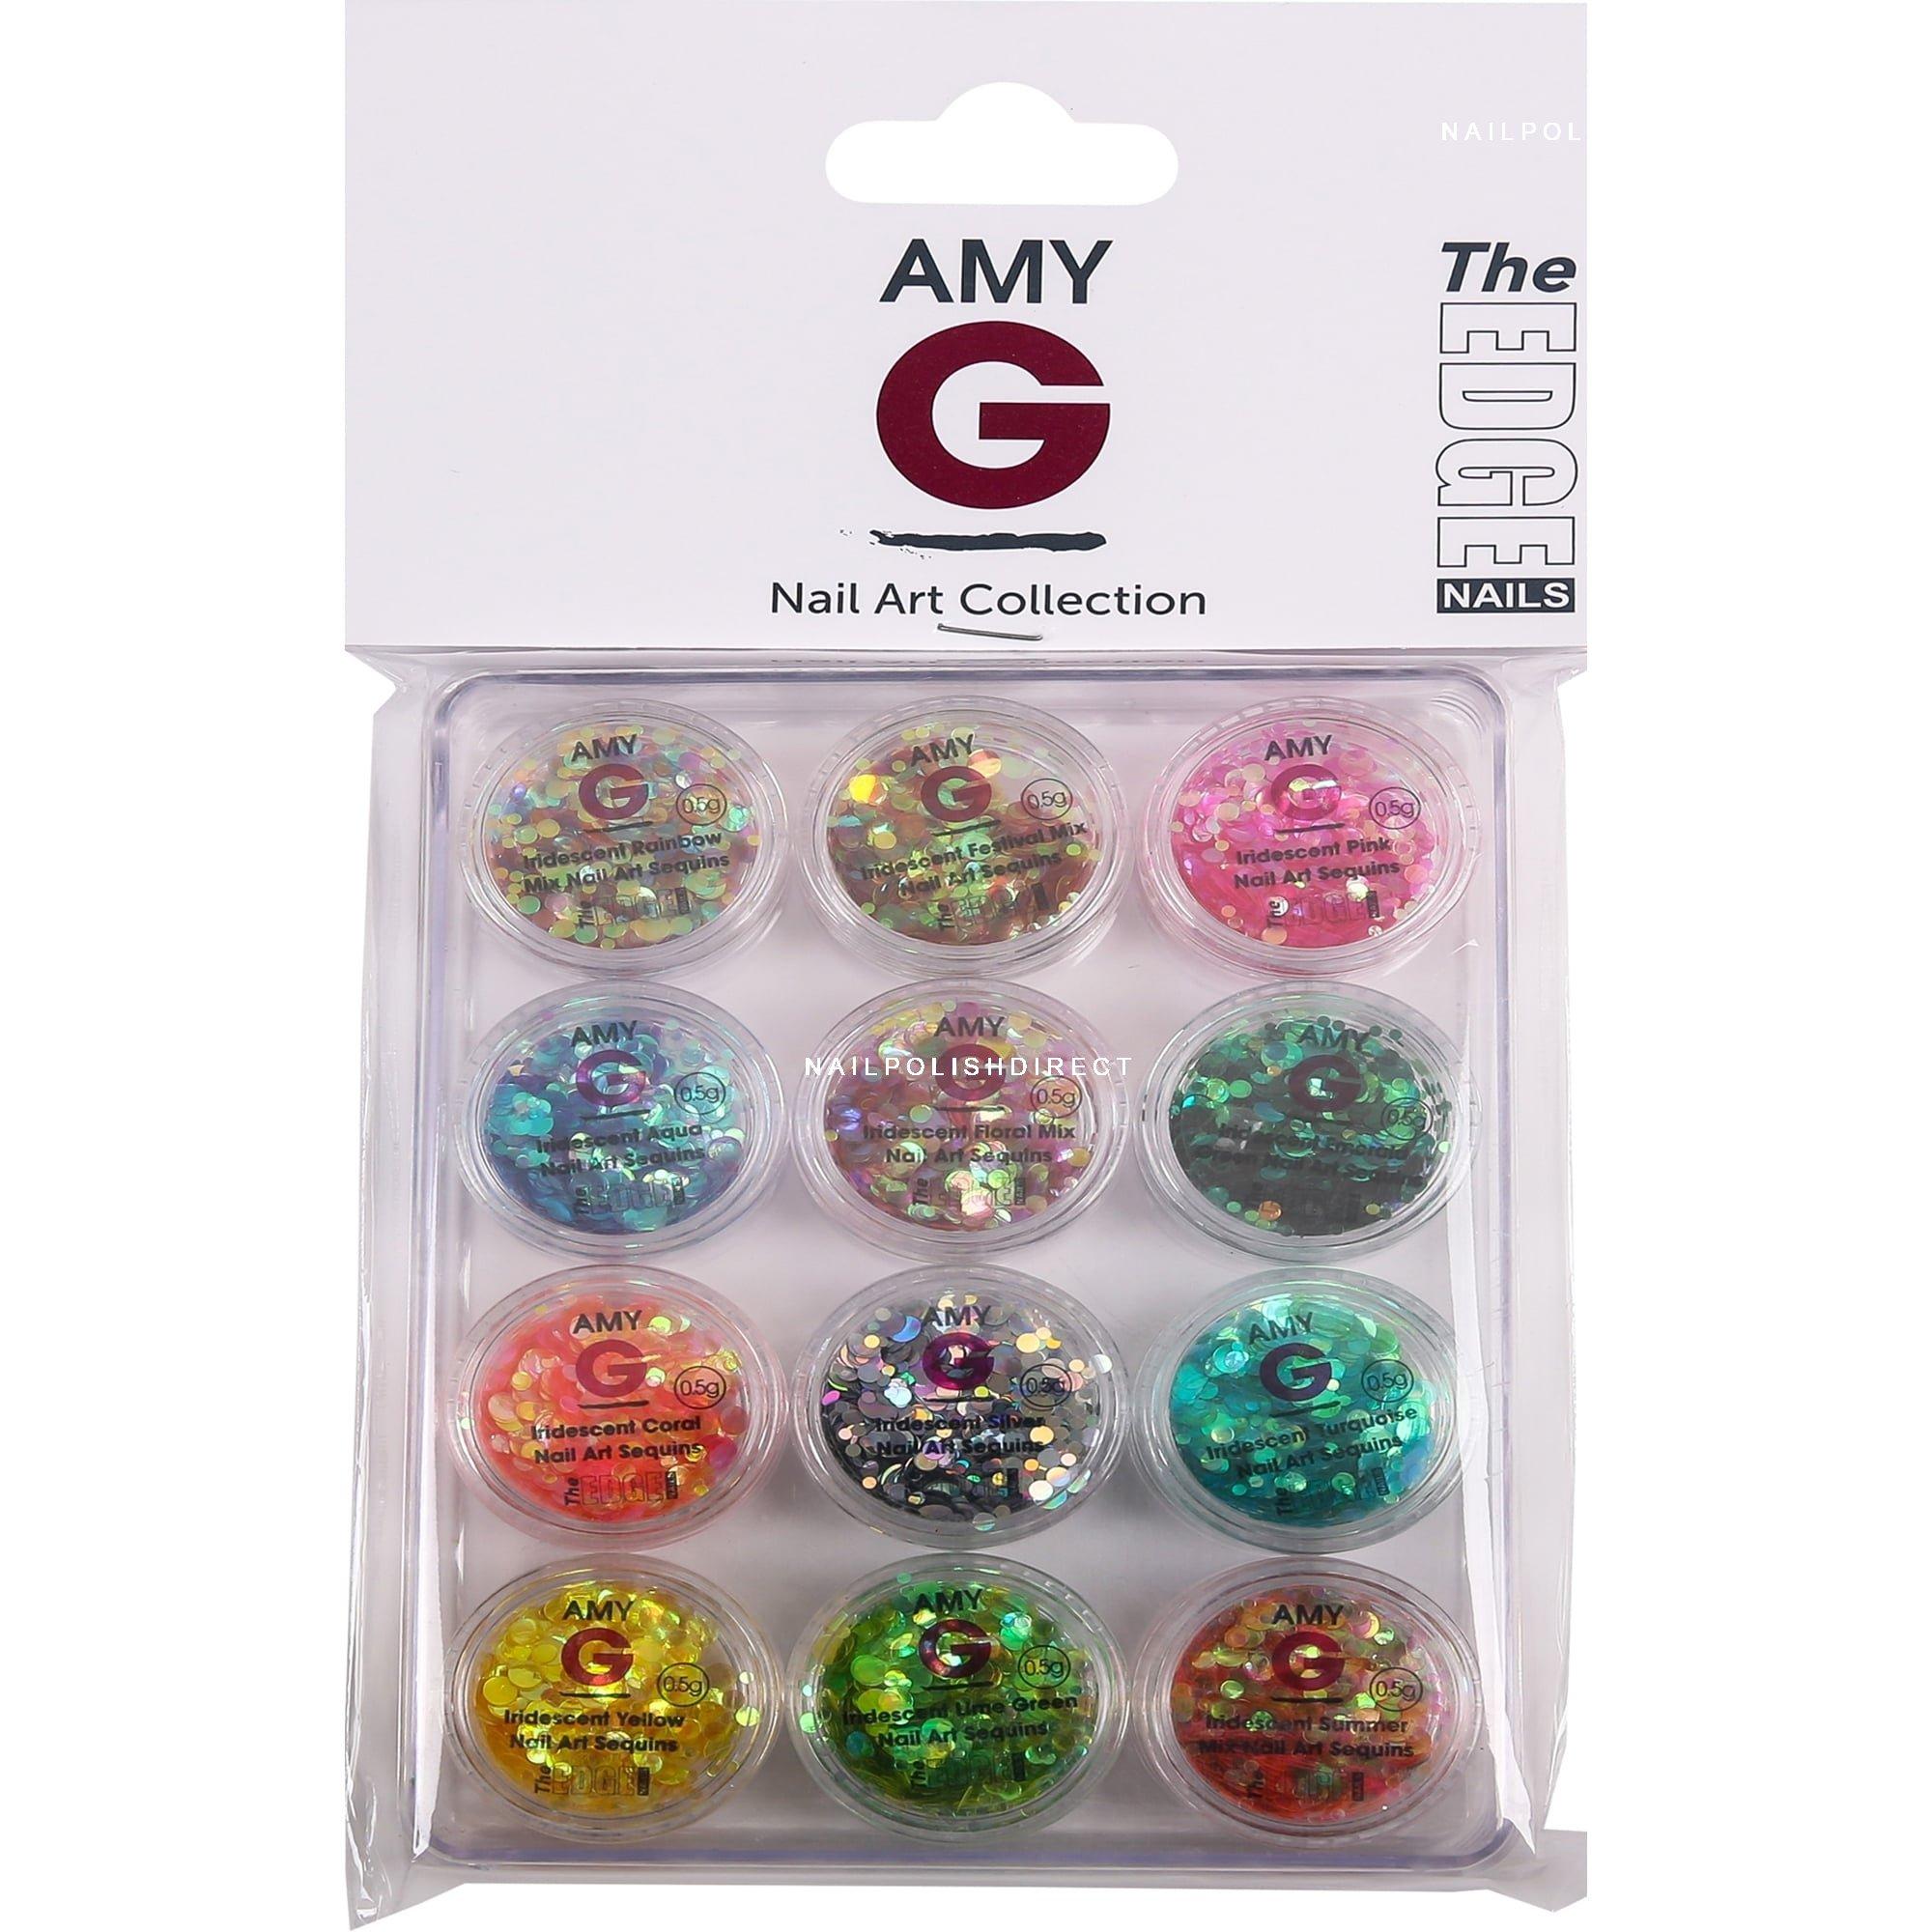 Amy G - Iridescent Nail Art Sequins - Iridescent Kit (3003081)